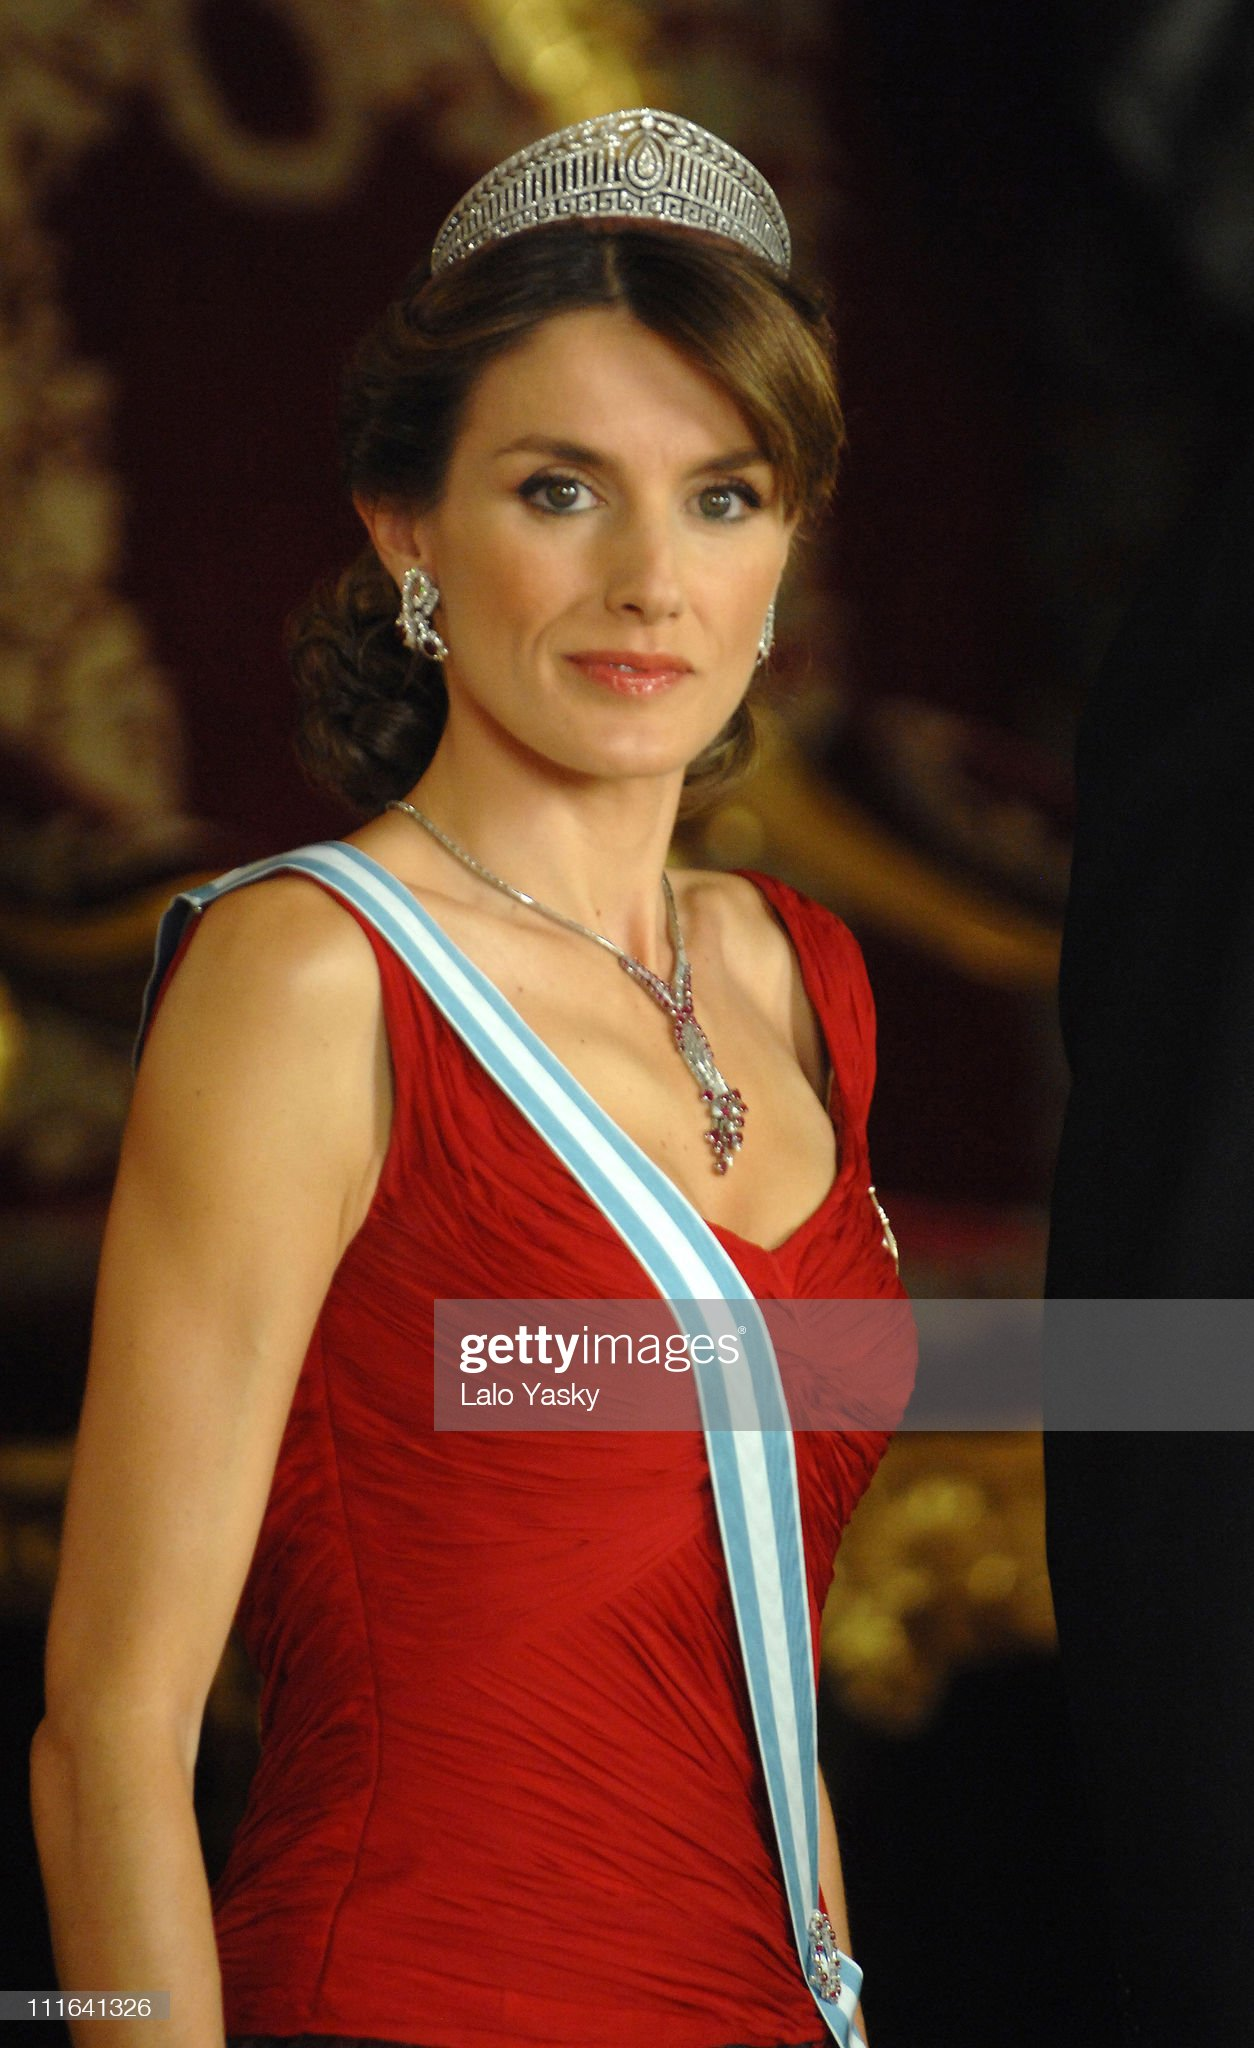 Вечерние наряды Королевы Летиции Spanish Royals Host Gala Dinner in Honour of Slovakian President : News Photo